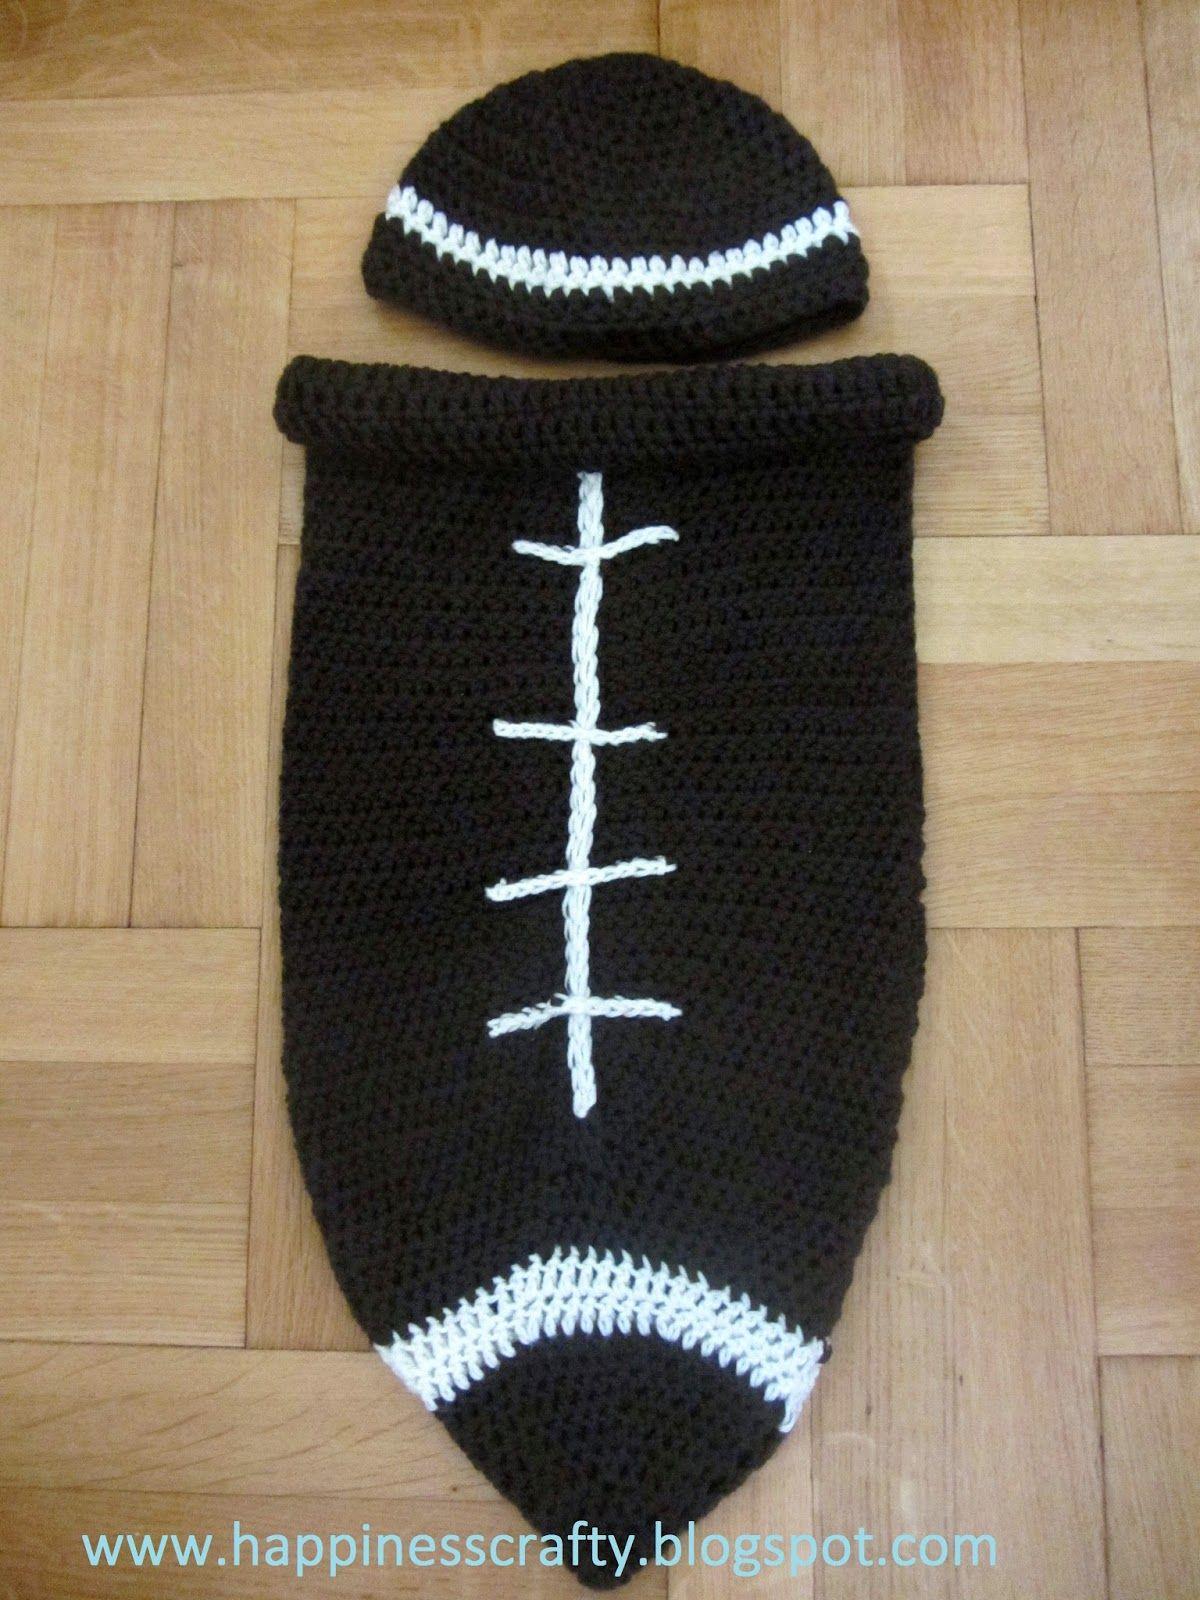 Happiness Crafty: Crochet Newborn Football Cocoon ~ Free Pattern ...